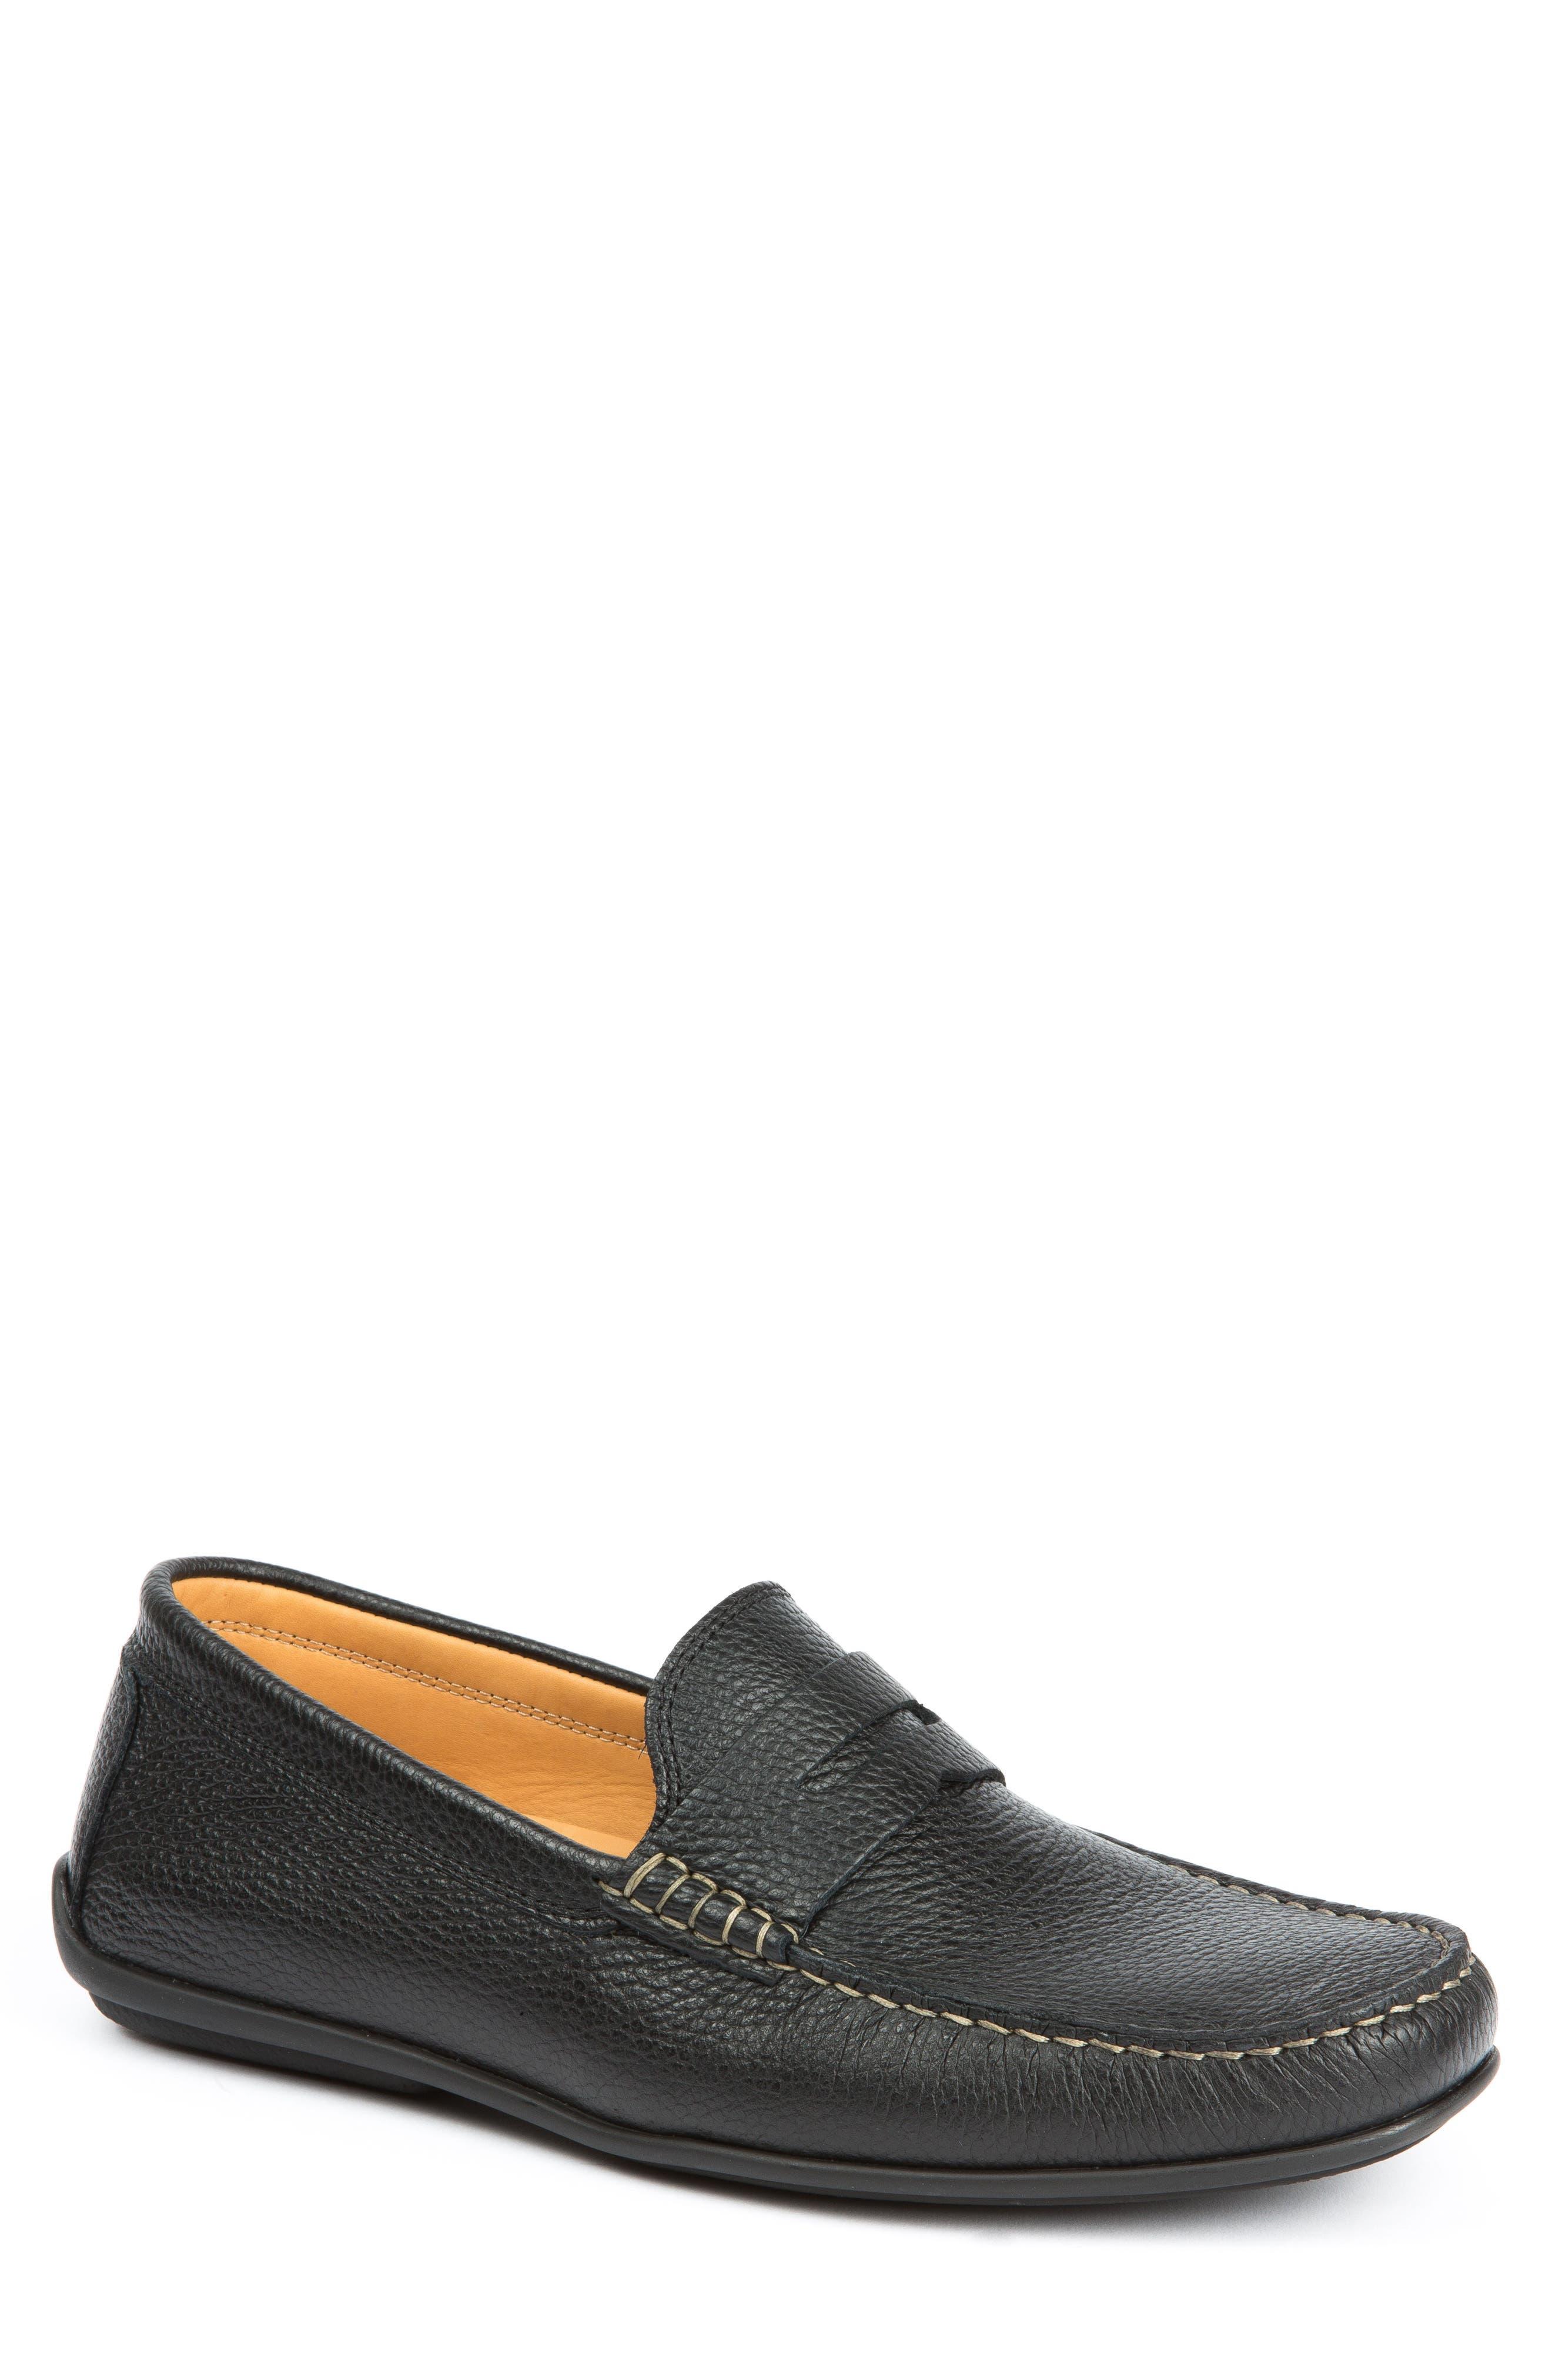 Hudsons Driving Shoe,                             Main thumbnail 1, color,                             Black Grain